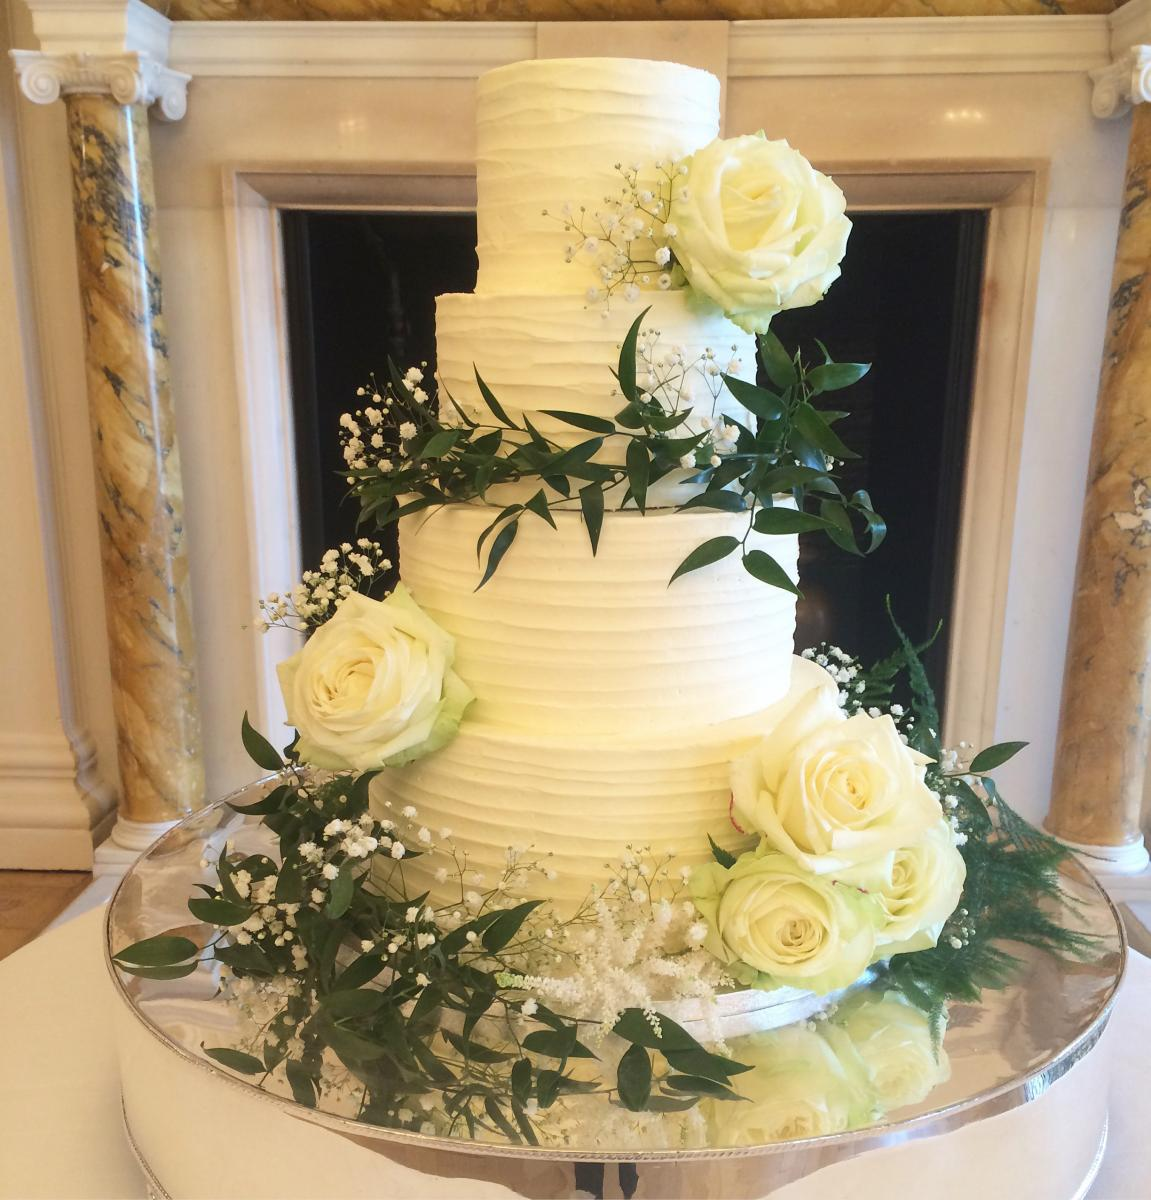 Average Price Of Wedding Cake For 250 Average Cost Of A Wedding Cake ...